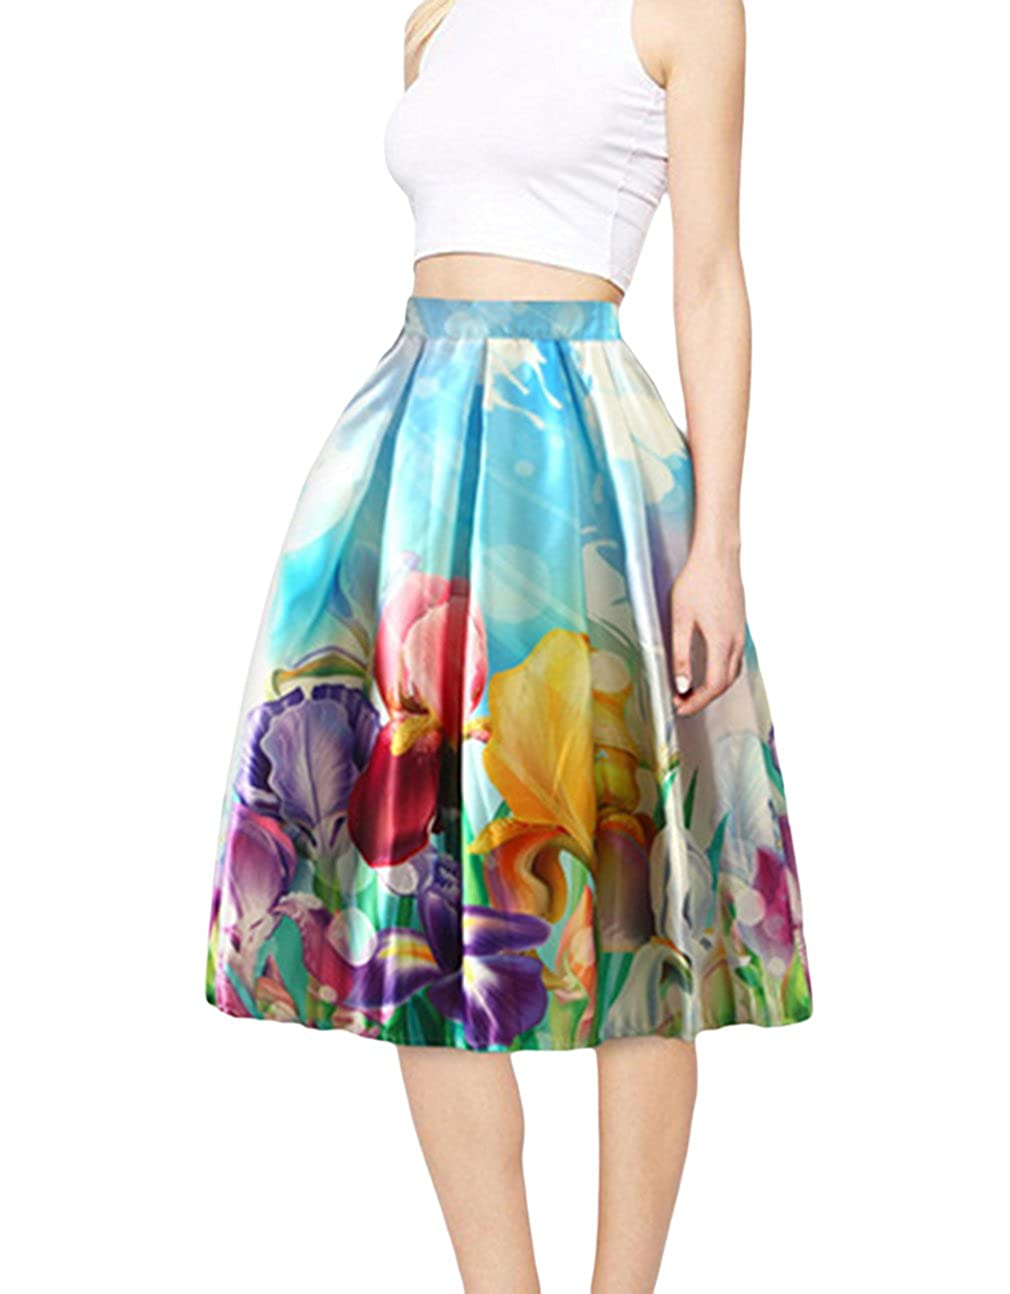 Jixin4you Geblümt Damen Knielang Sommerrock Faltenrock Skater-Rock Vintage Röcke mit Mehren Farben JX4U180124700